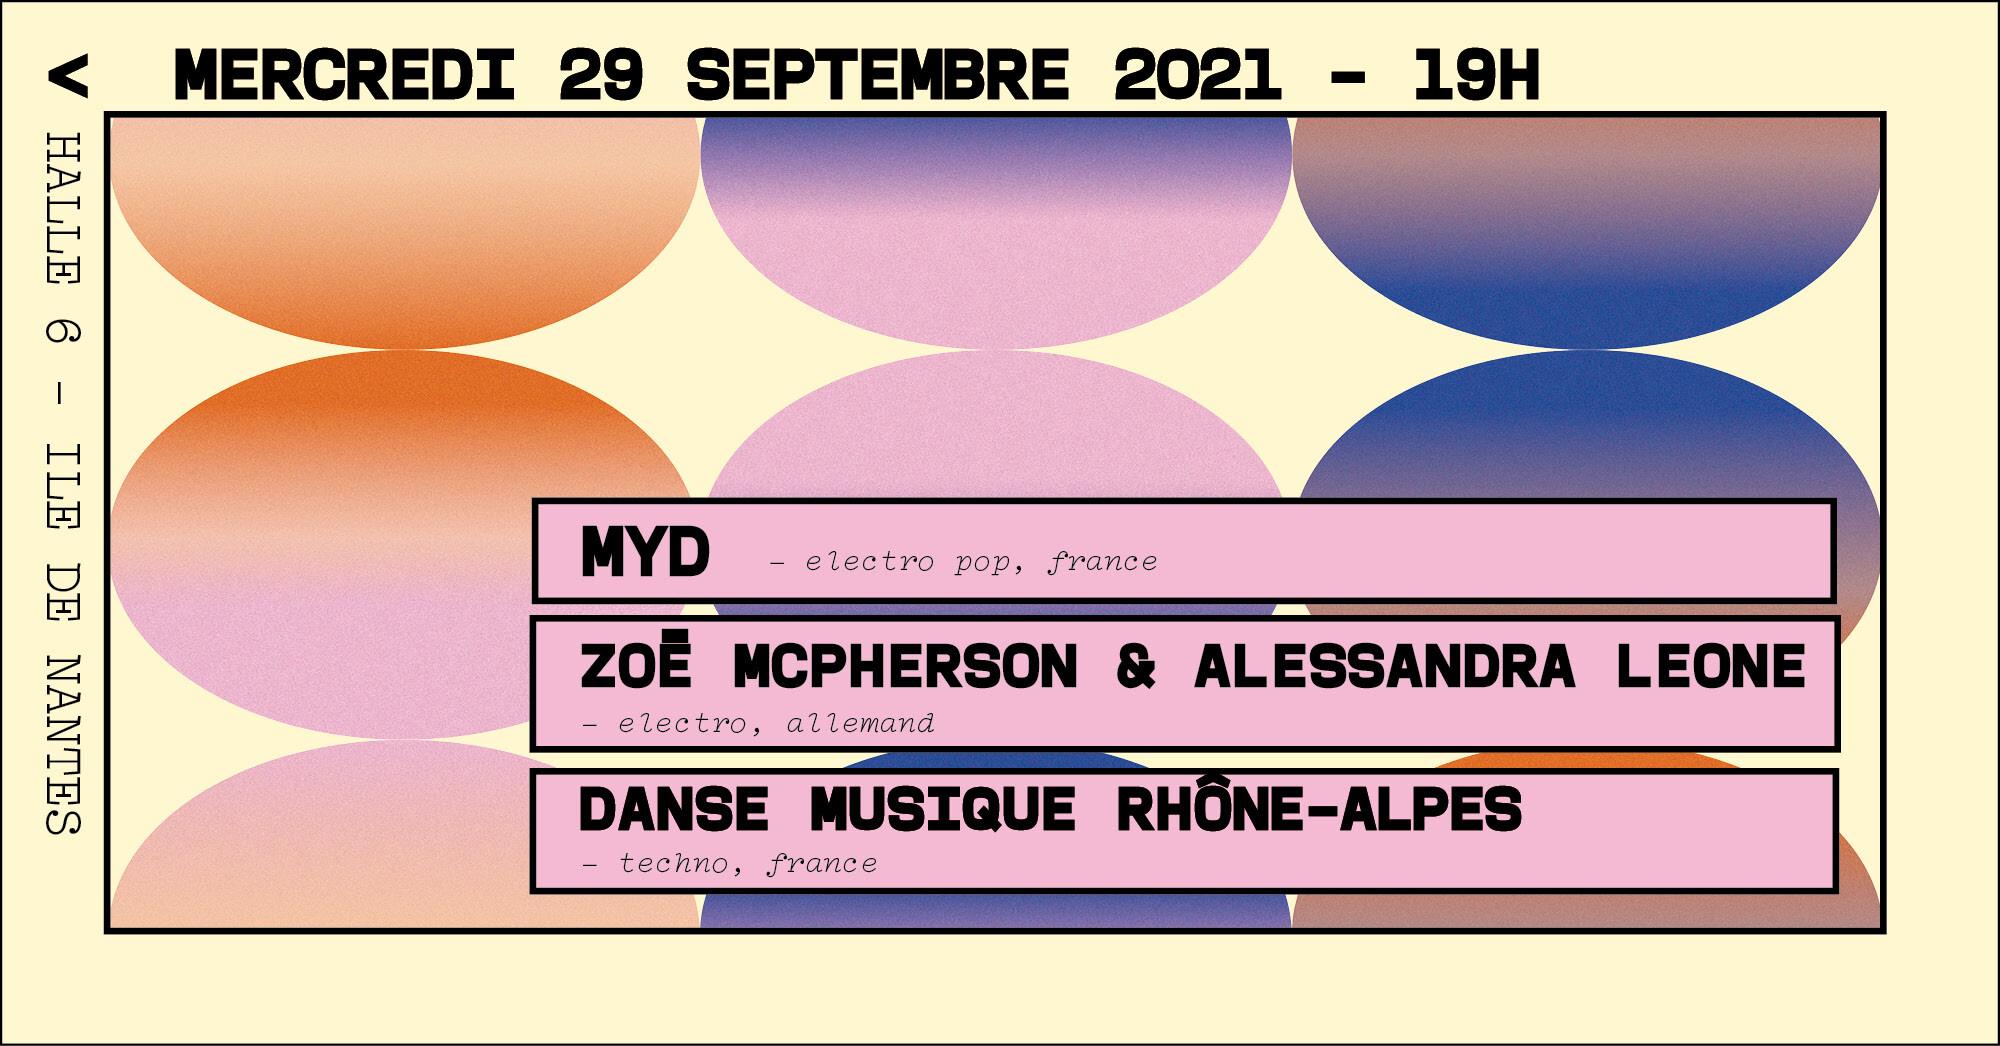 MYD, Zoë McPherson & Alessandra Leone, D.M.R.A